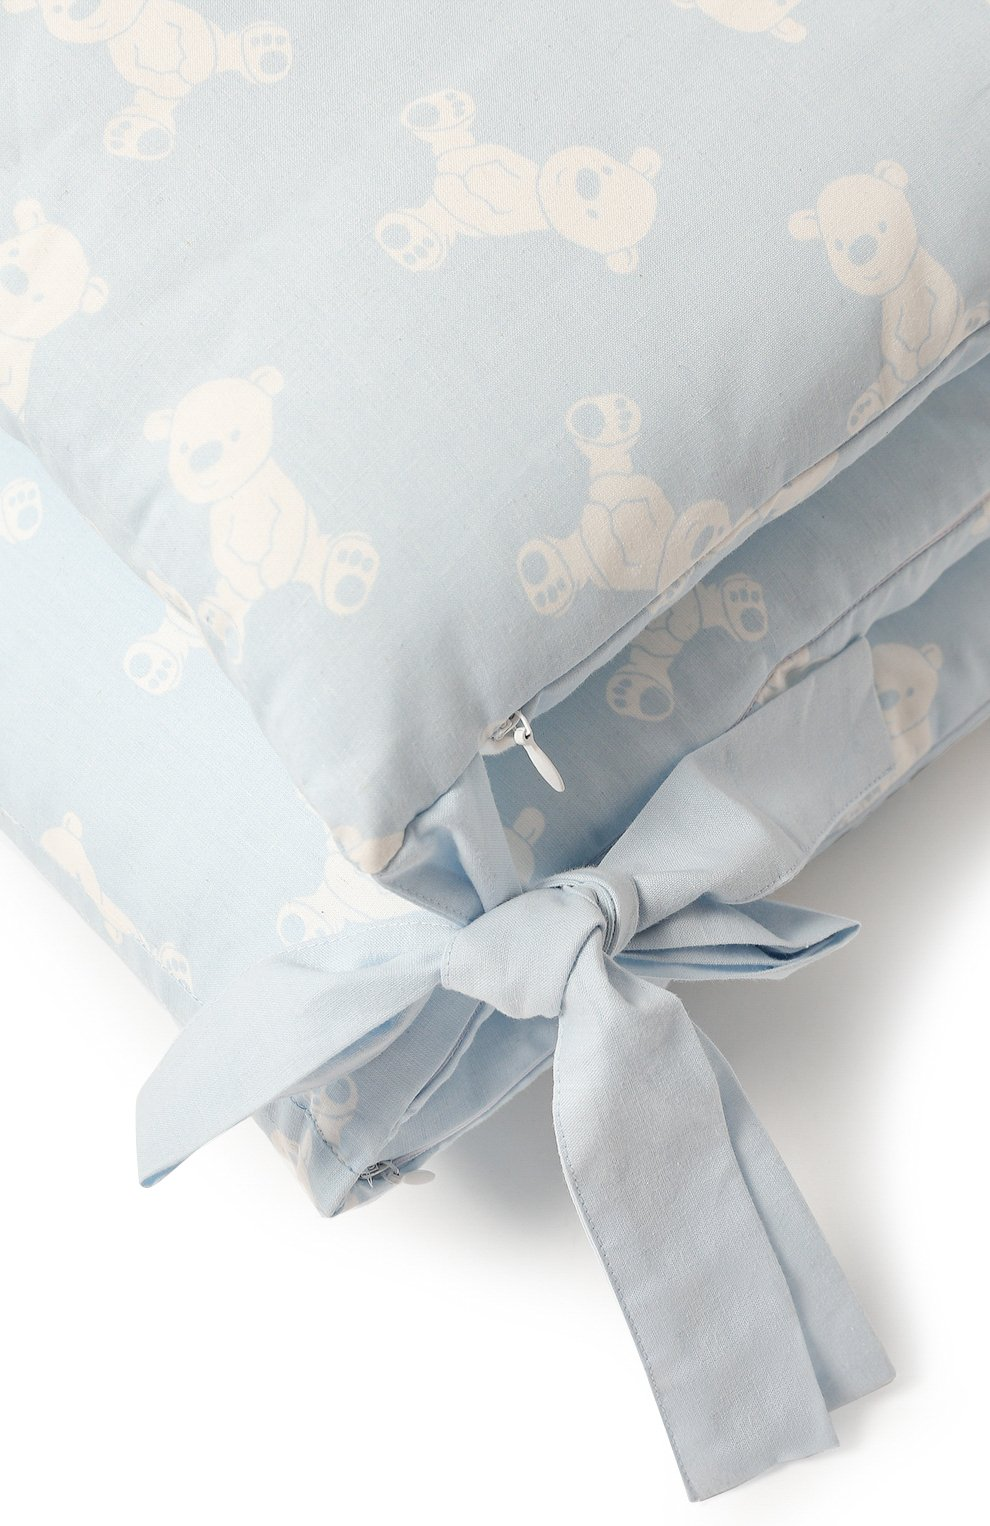 Детского комплект для кровати A&A BABY GLAM голубого цвета, арт. M7 BL 0301 12565 4 | Фото 5